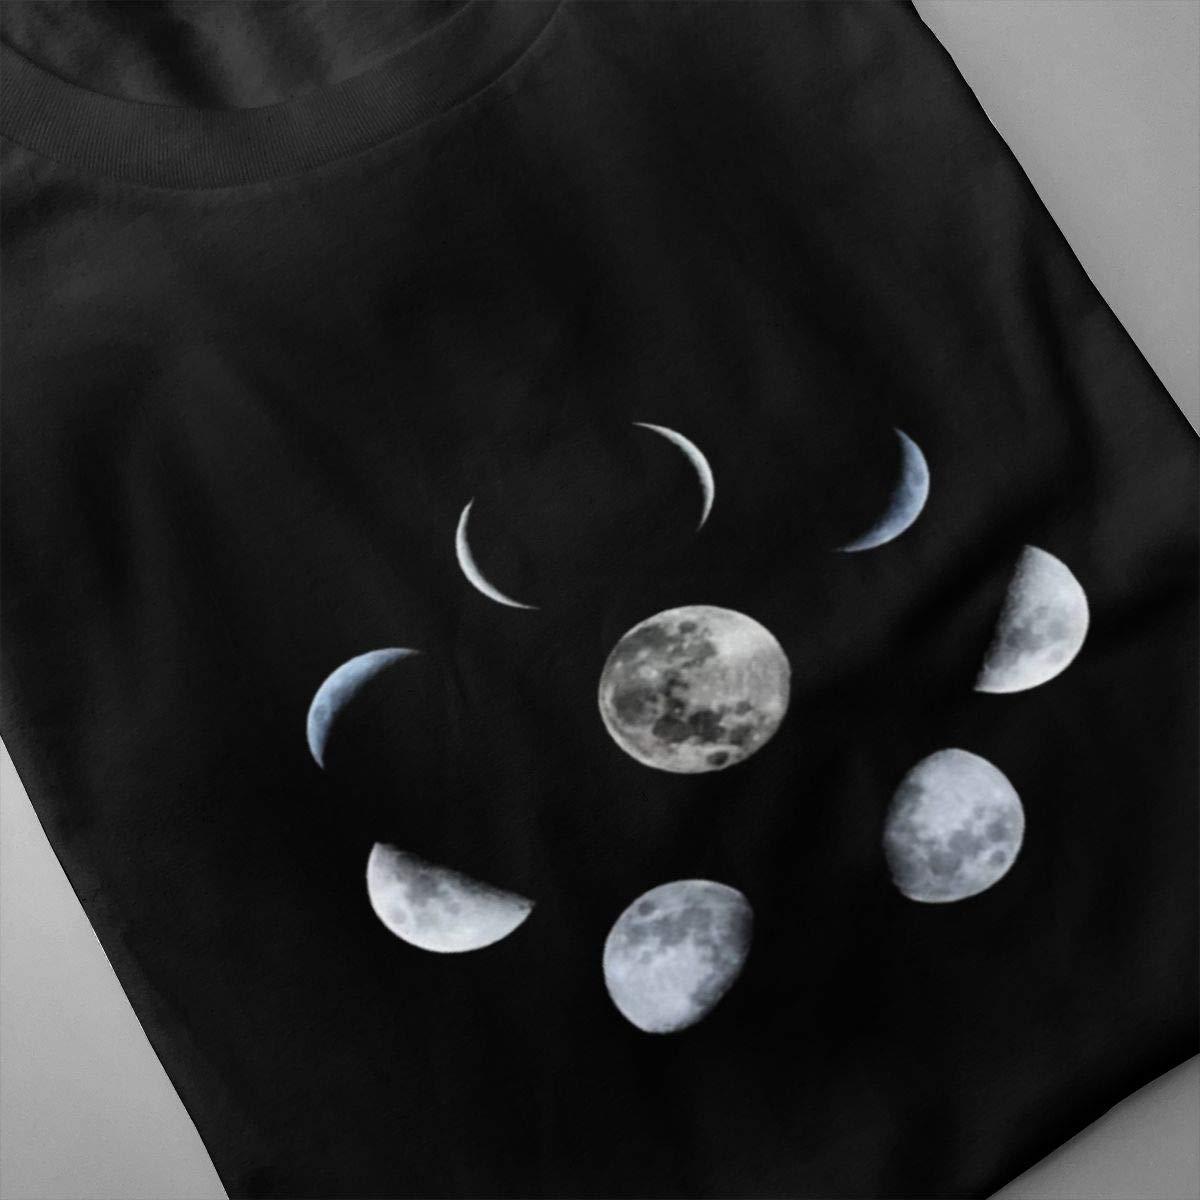 VIIHAHN Moon Phases Mens Casual Hikinground Neck Short Sleeve Shirt